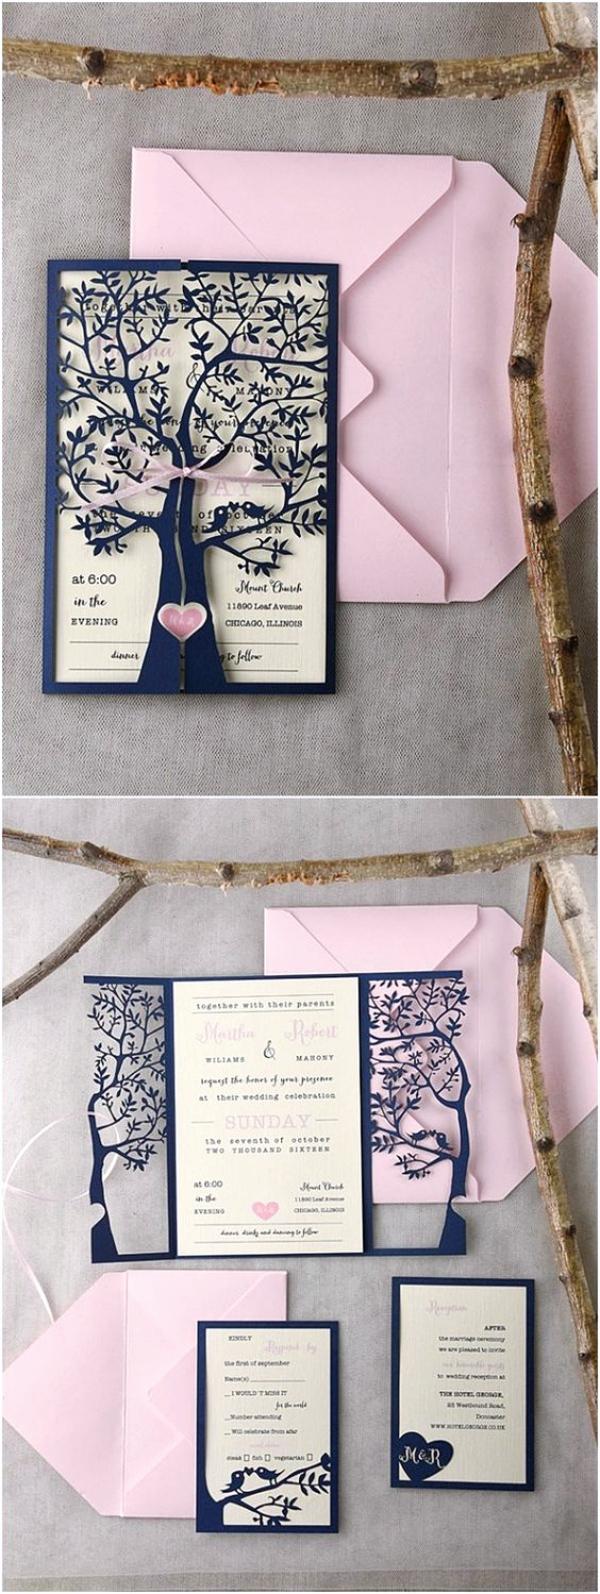 Wedding Invitation Card Ideas Best Of 30 Creative Wedding Invitation Card Ideas Bored Art